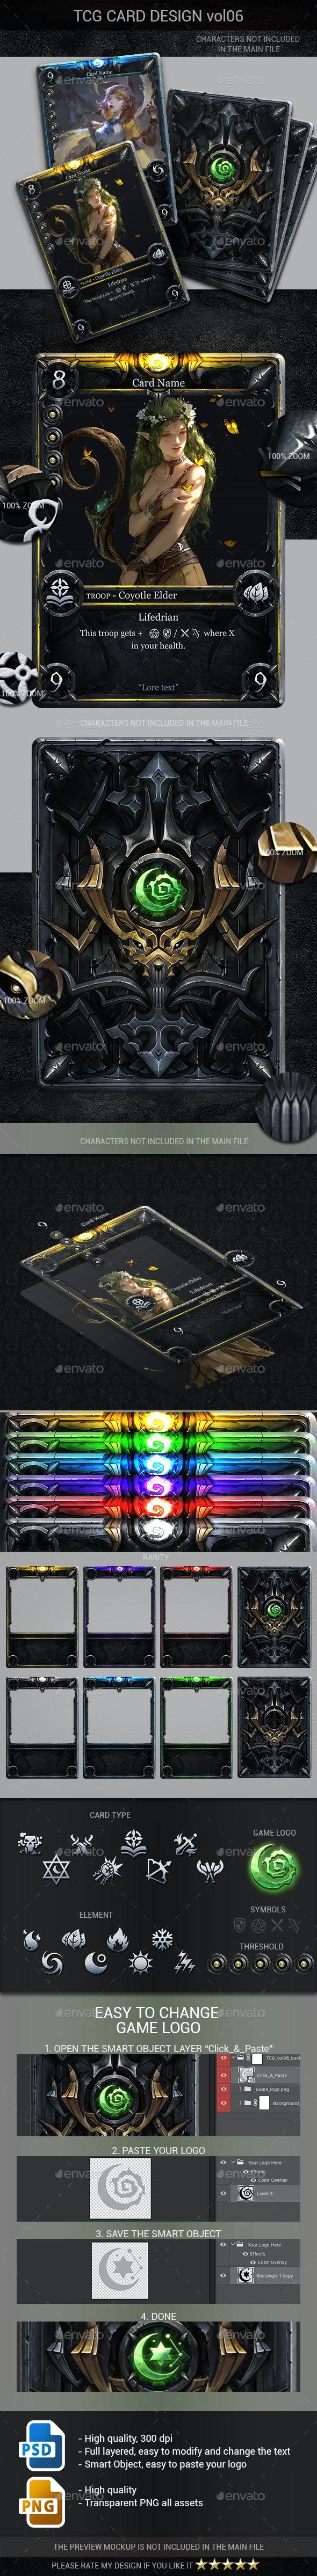 TCG Card Design Vol 6